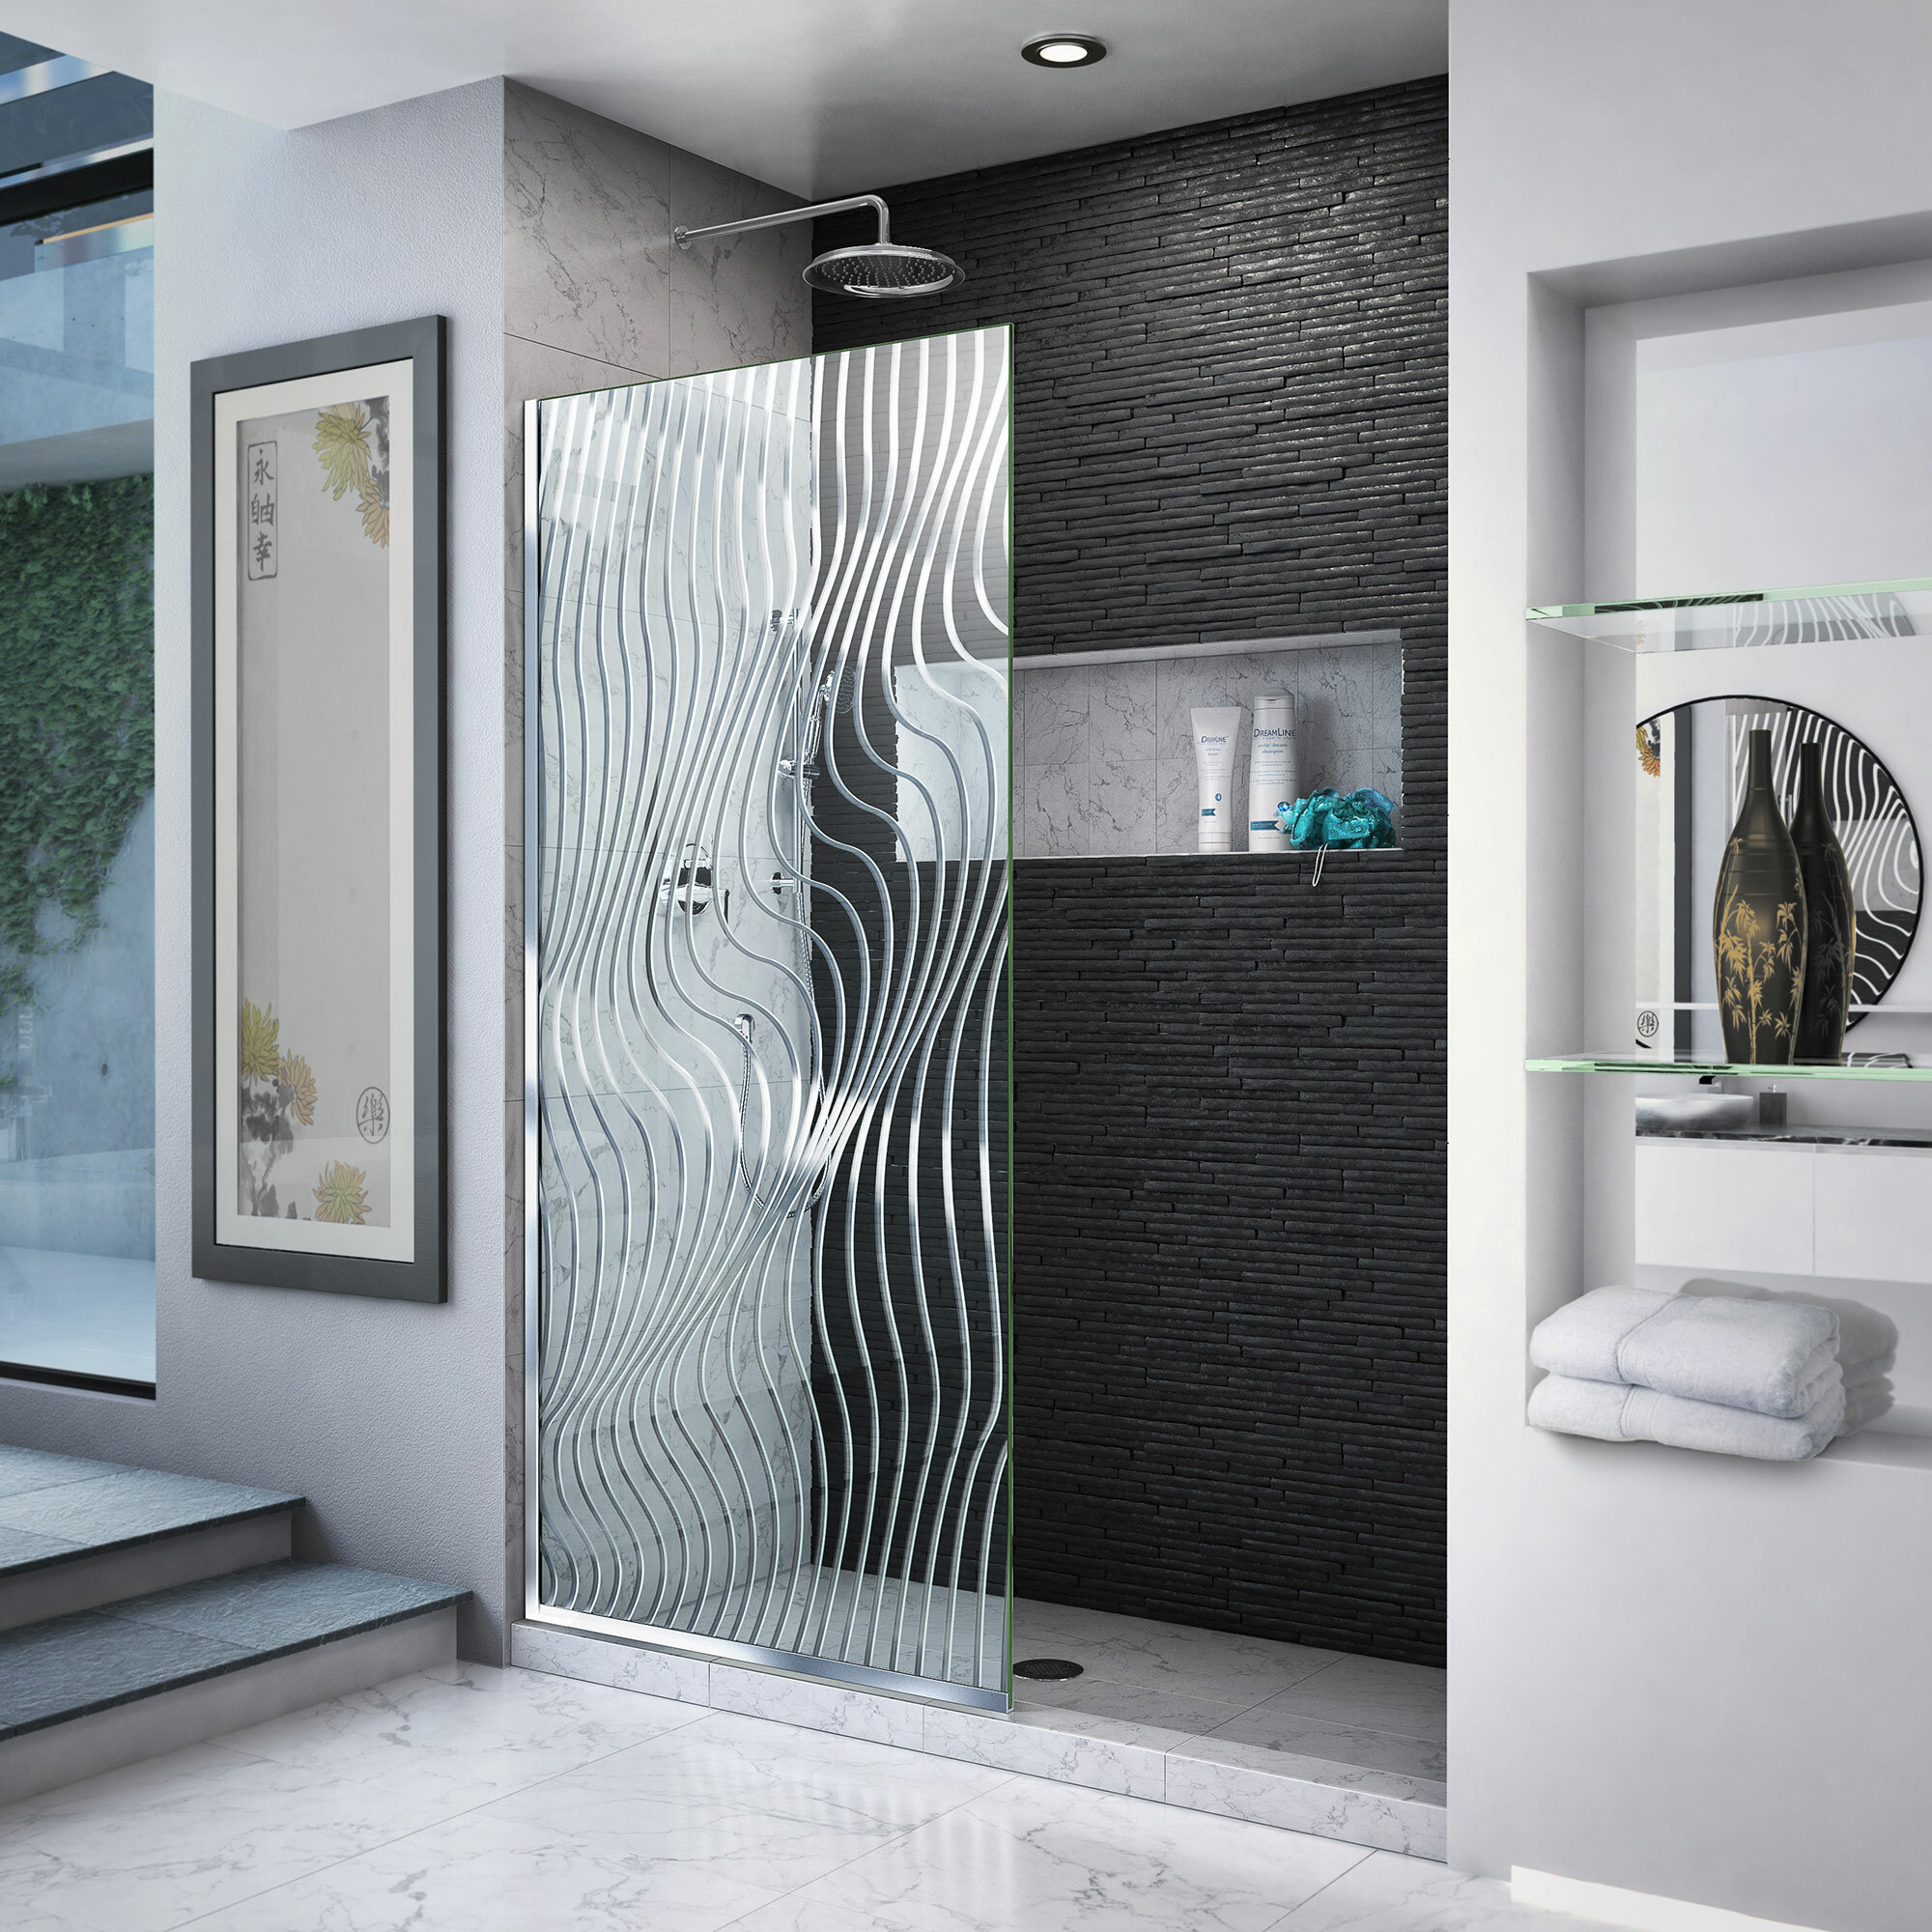 Platinum Linea 34 X 72 Screen Frameless Shower Door With Clearmax Technology